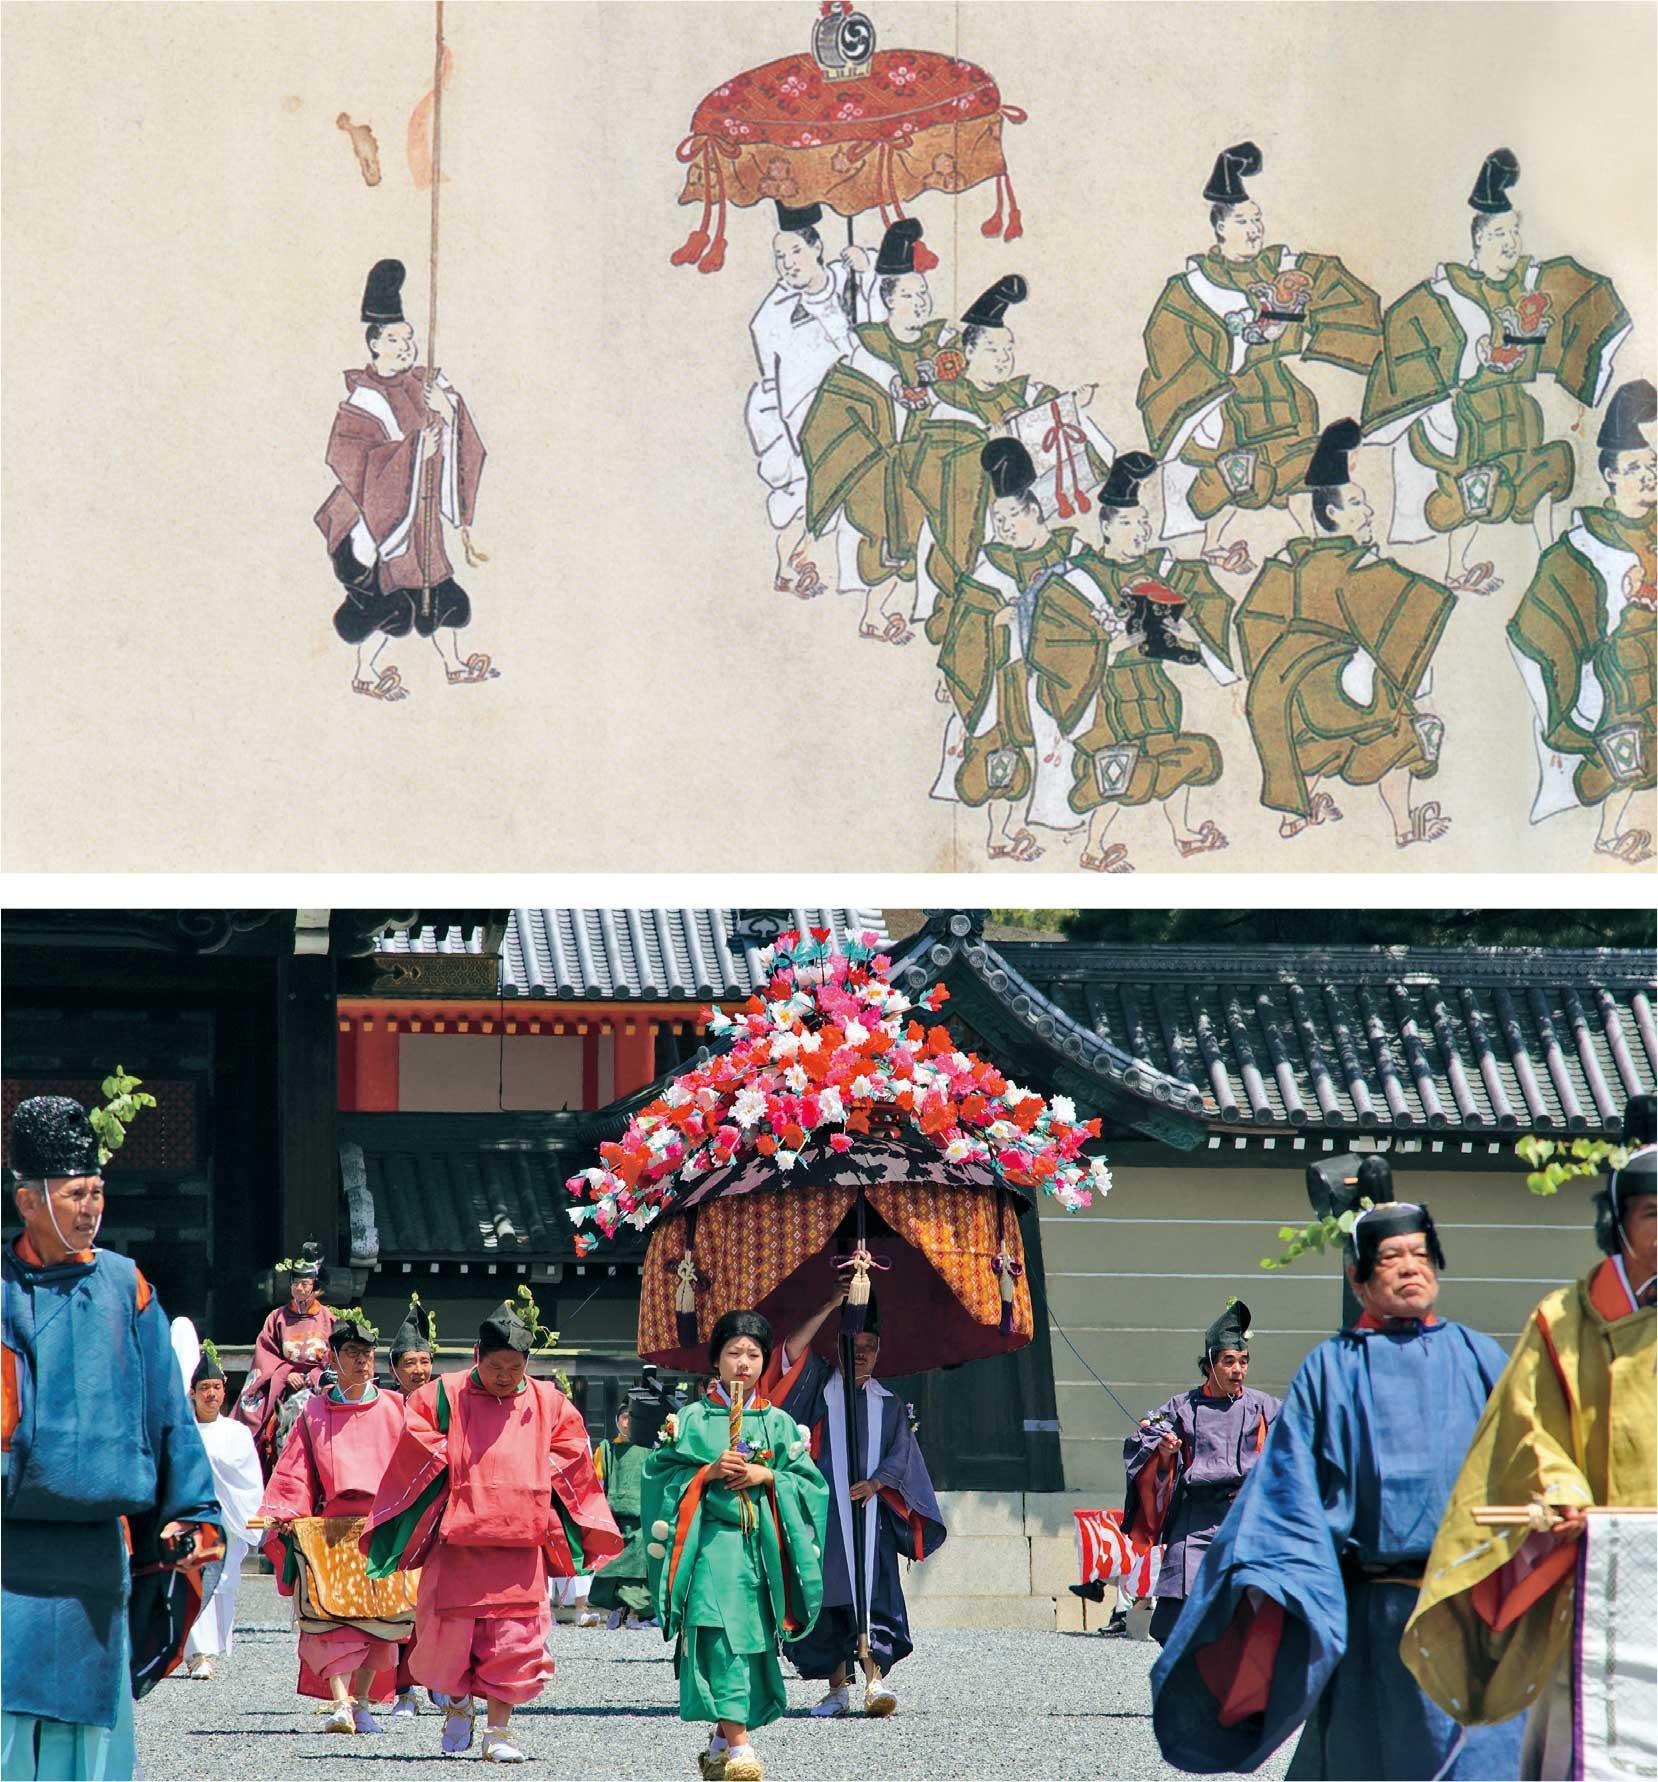 葵祭と風流傘